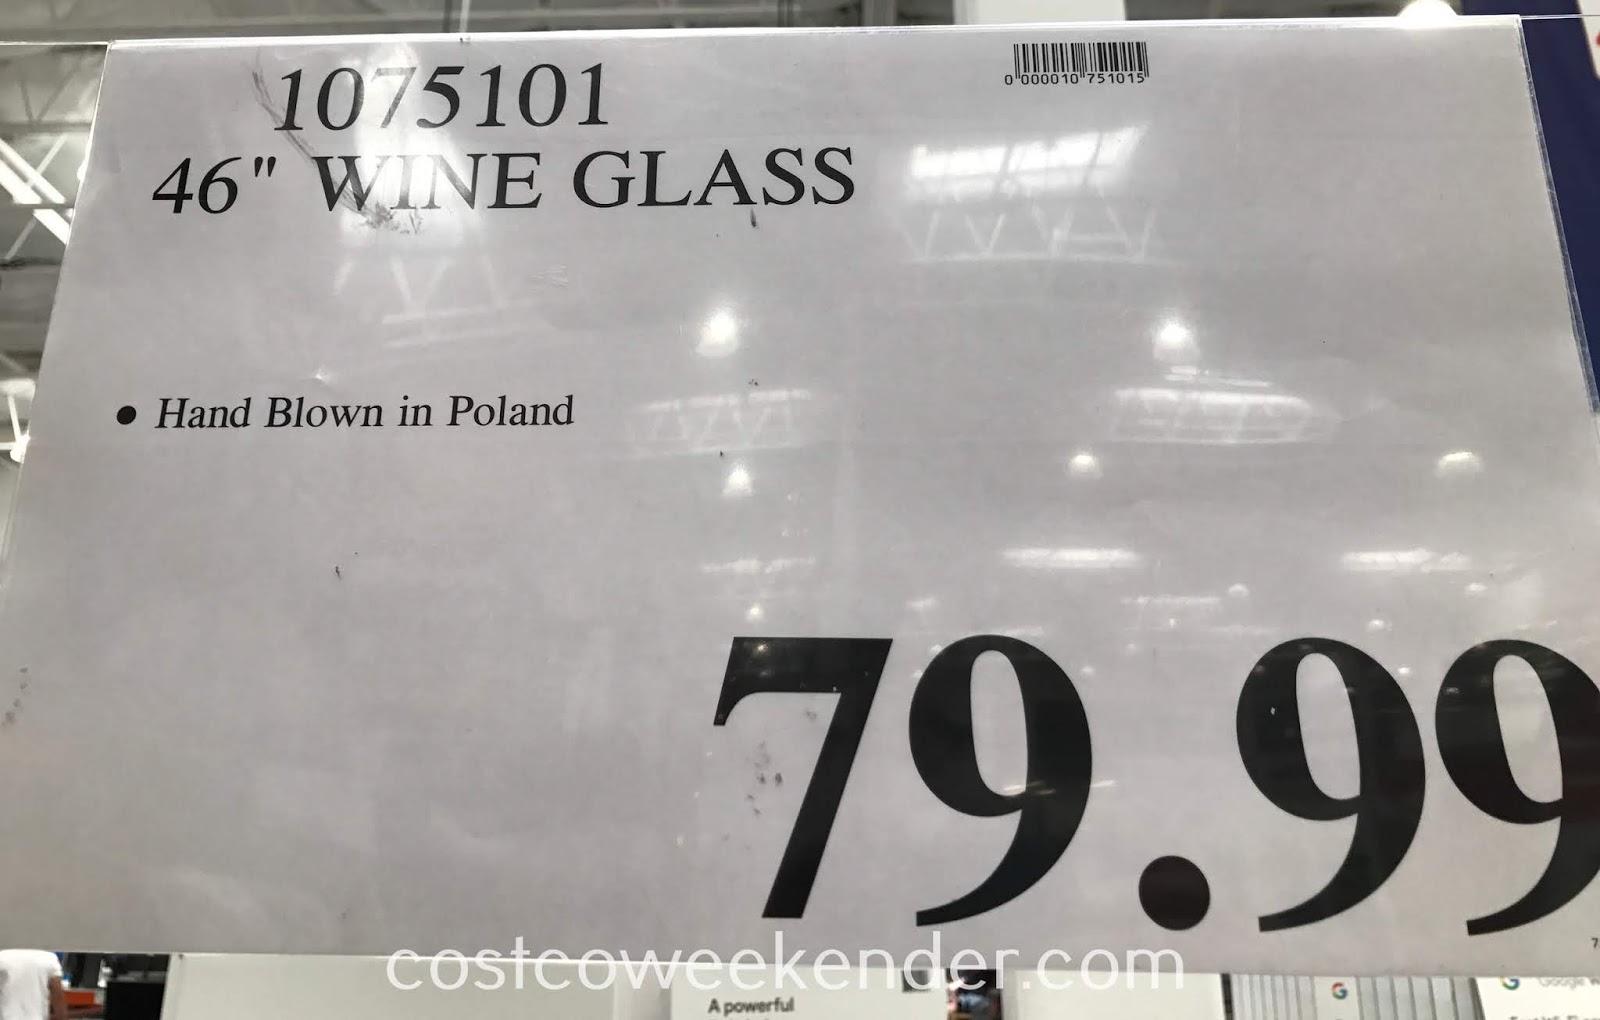 Costco 1075101 - Deal for the 46in Wine Glass at Costco